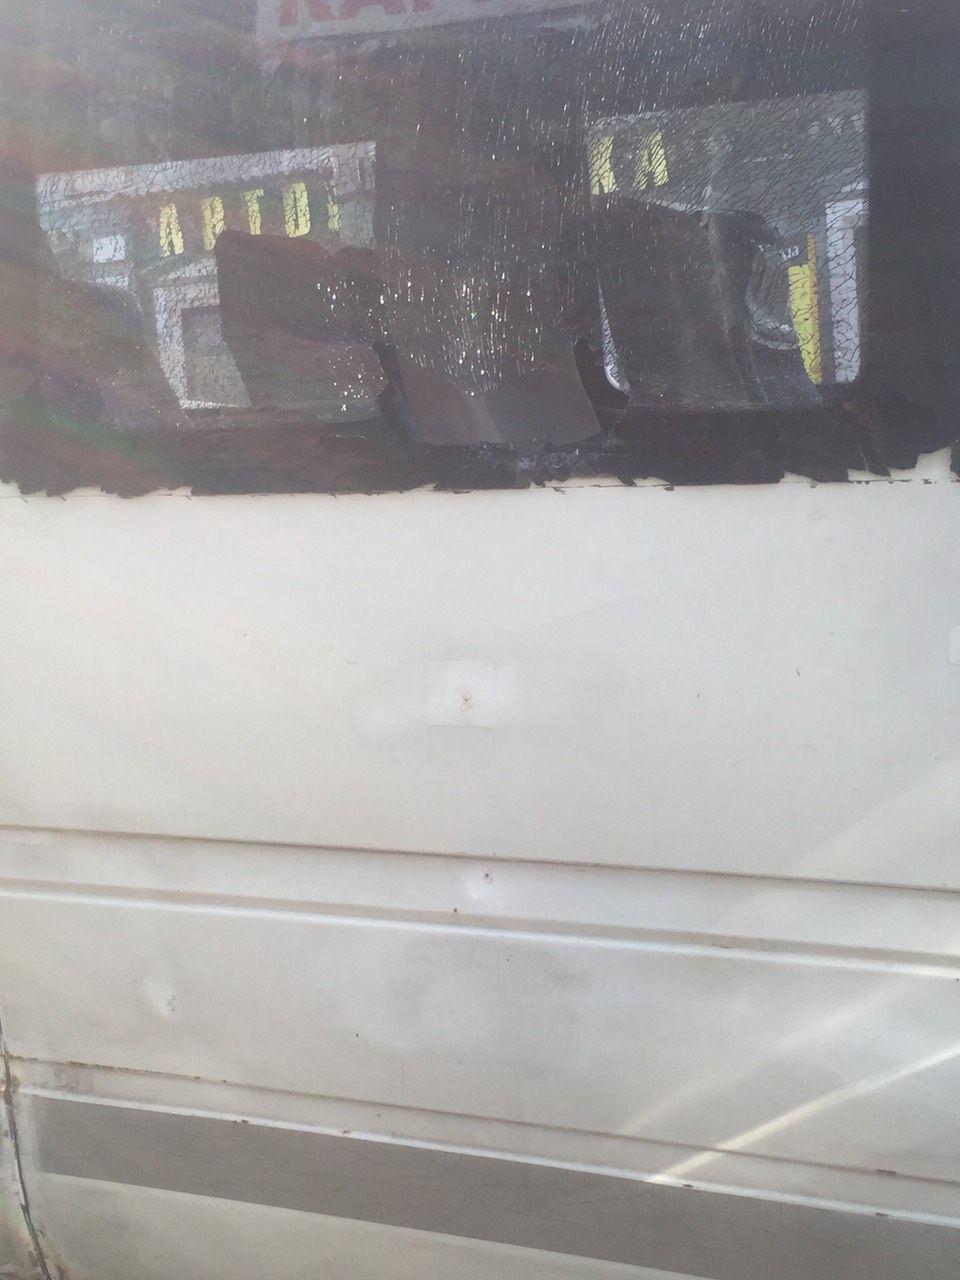 Новости Днепра про Разбитое окно и драка: потасовка в маршрутке Днепра